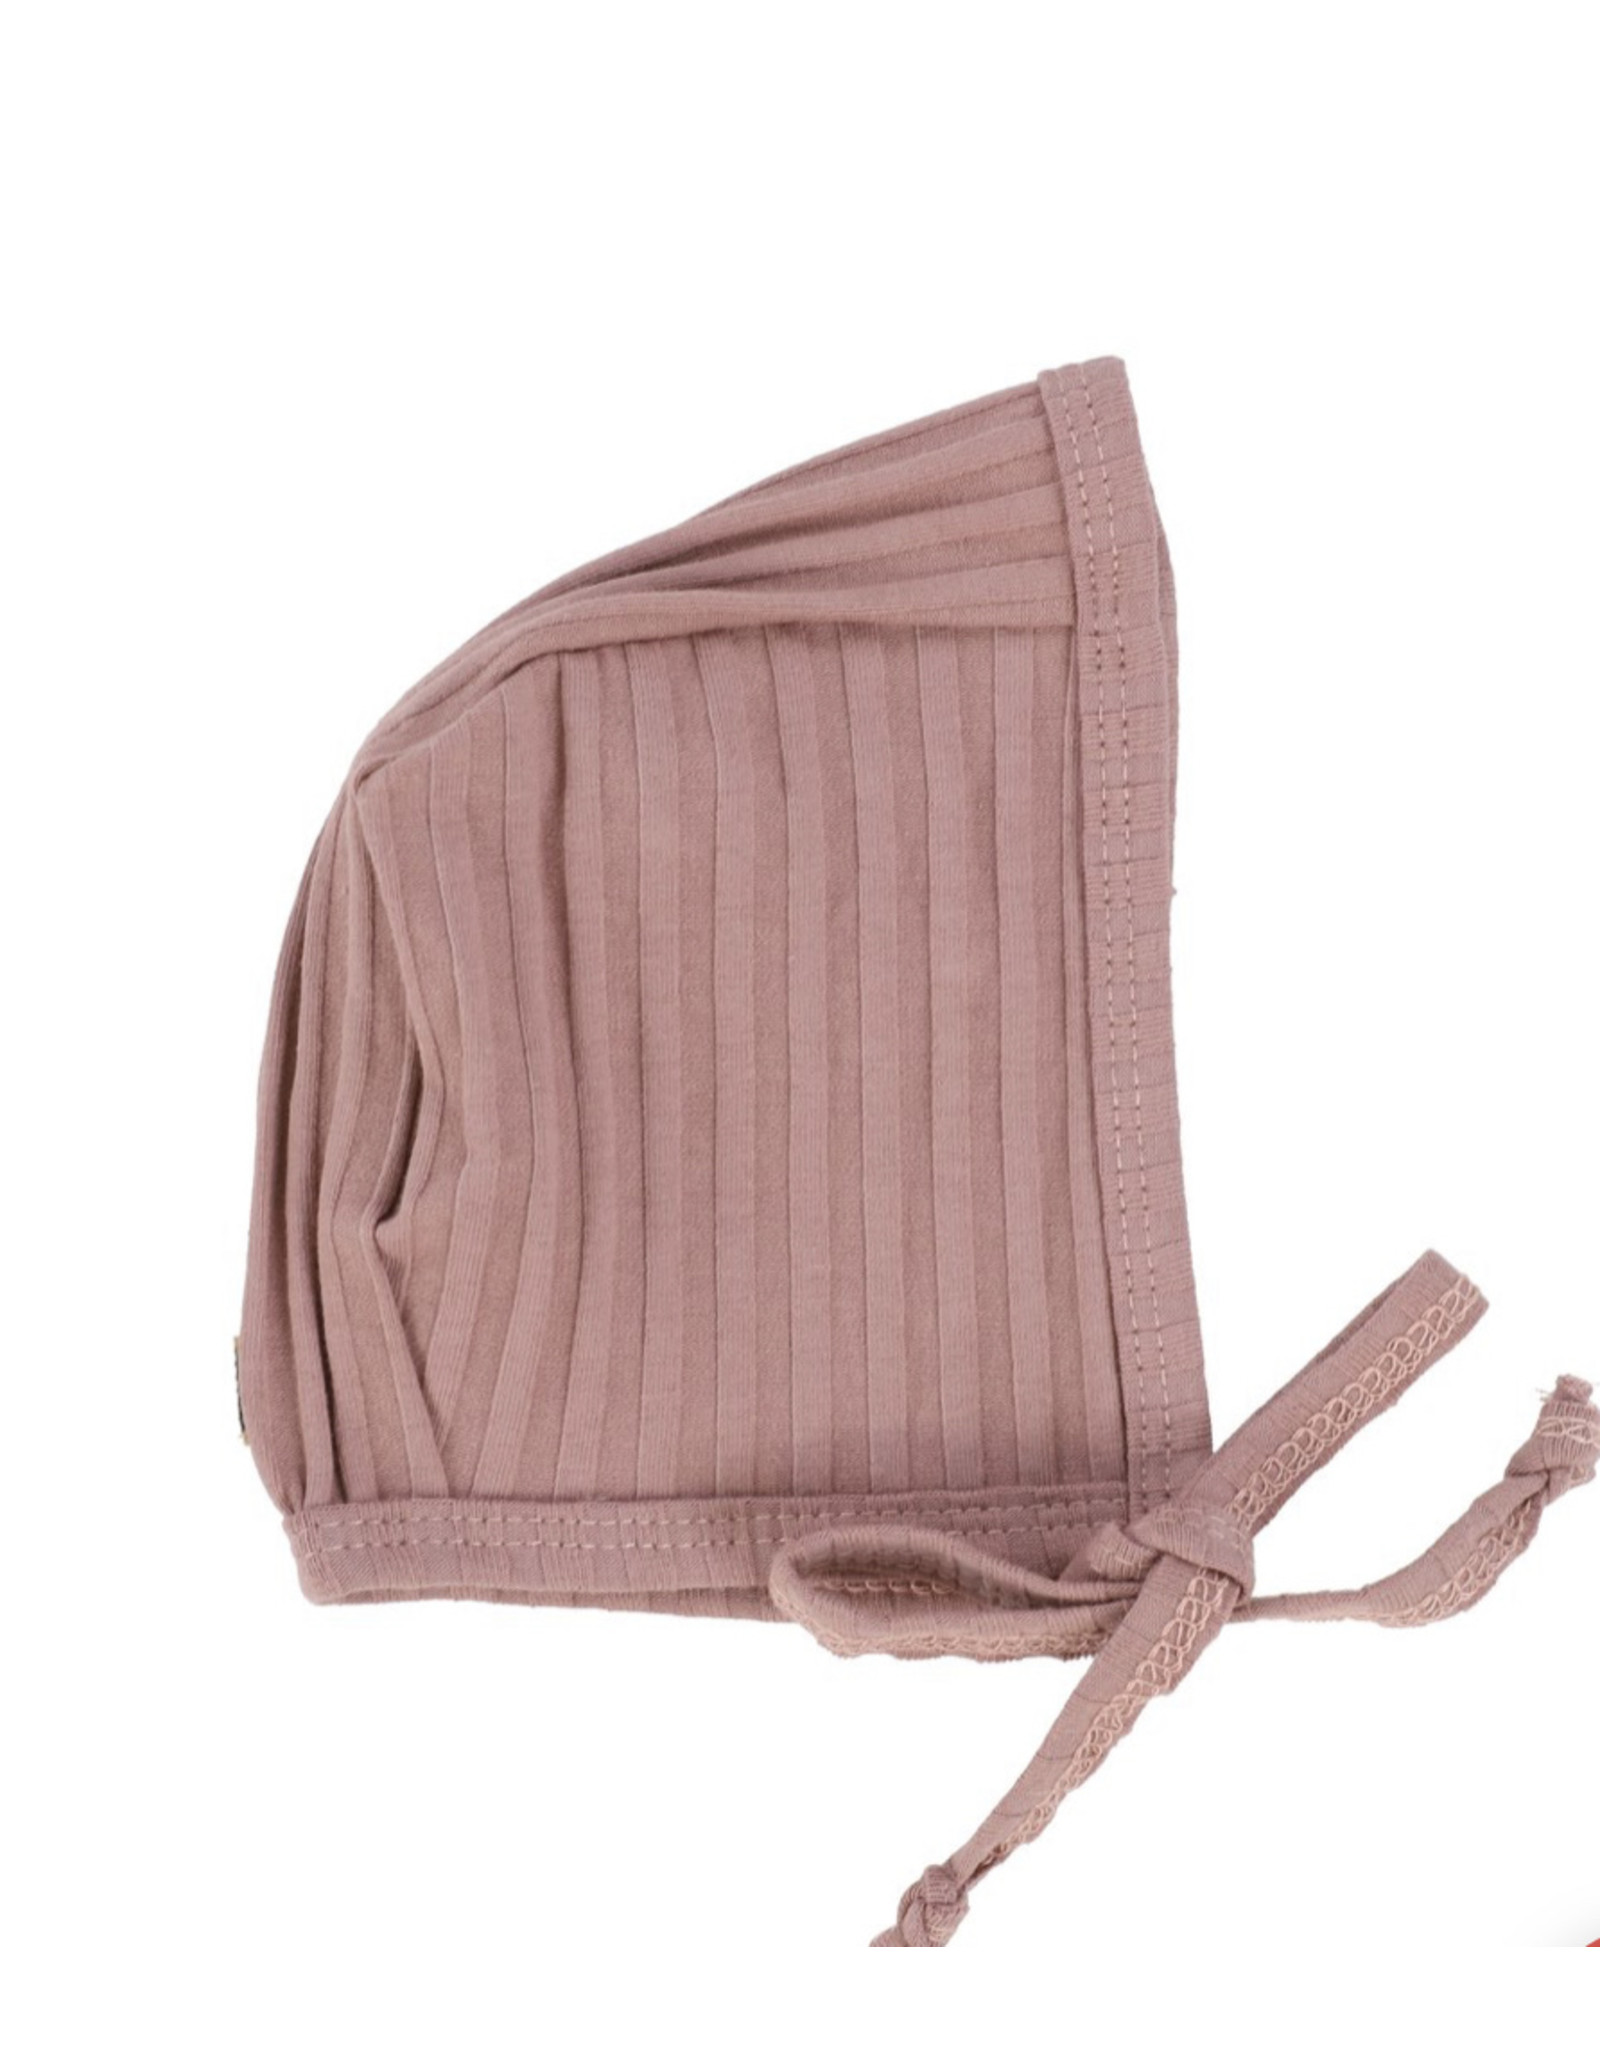 Lil leggs Lil Leggs Purple Wide rib Bonnet